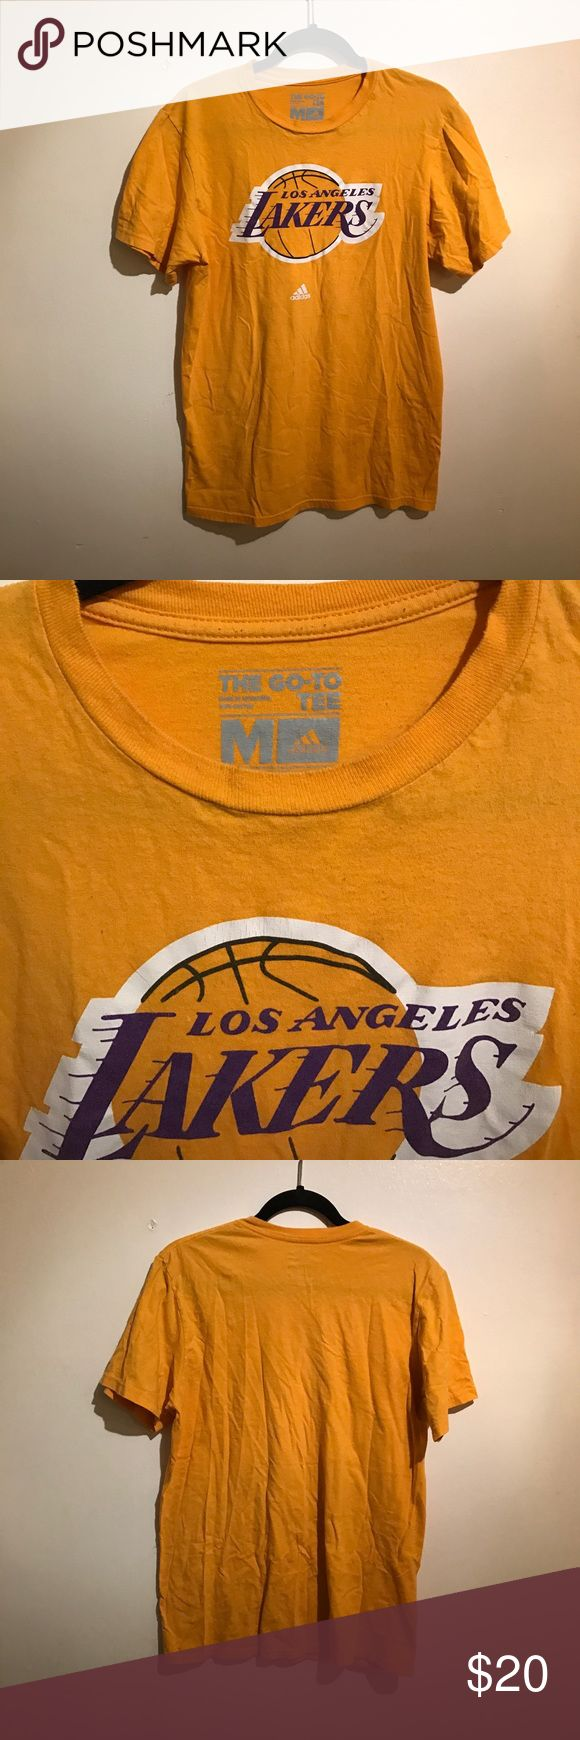 LA Lakers Tee Yellow LA Lakers shirt. Slightly worn. Shirts Tees - Short Sleeve